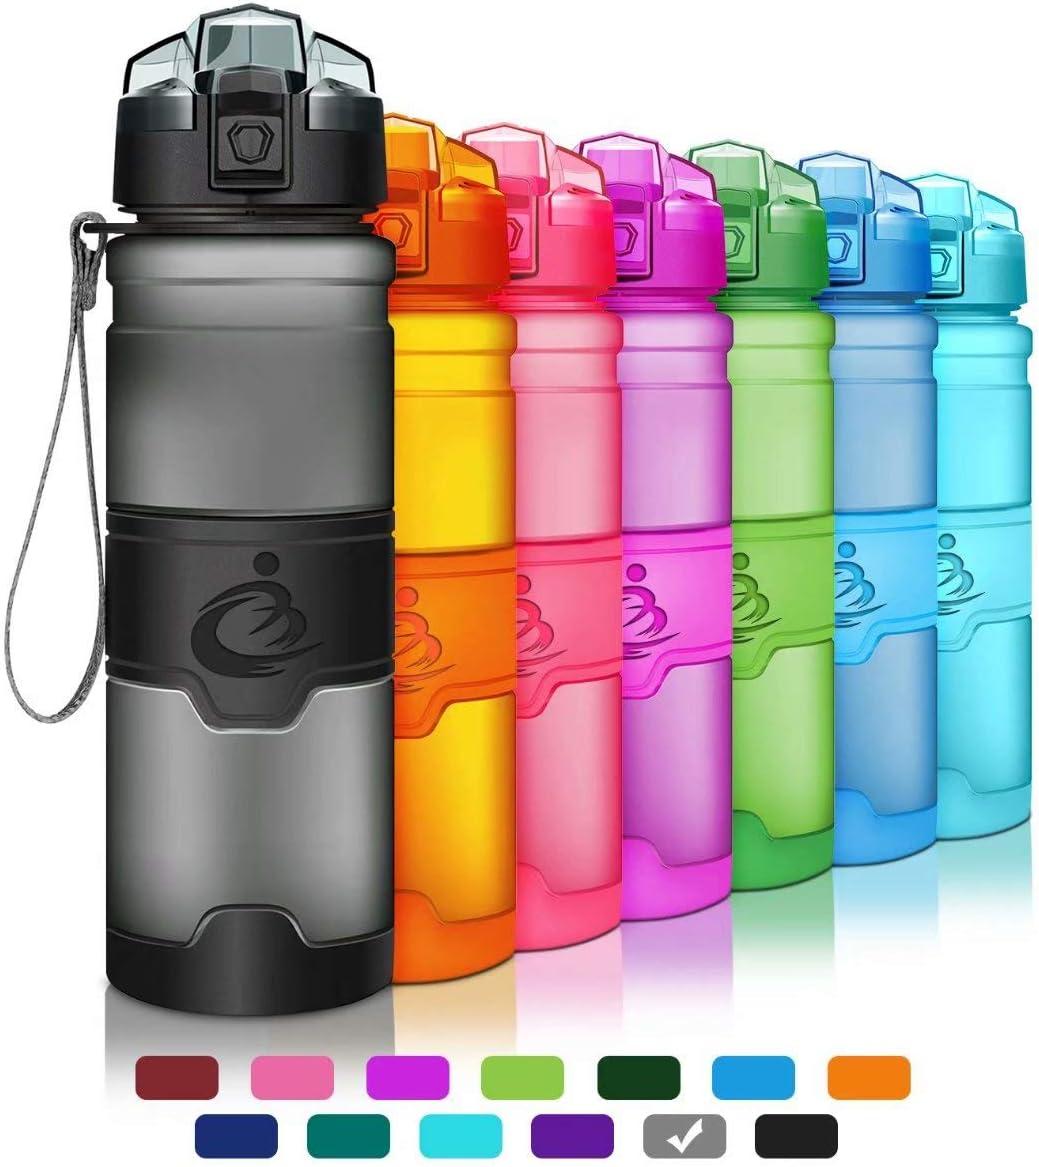 Grsta Sports Water Bottle,Leak-Proof Tritan Plastic BPA Free Kids Water Bottle with Filter Locking Flip Lid,14 Oz,17 Oz,25 Oz,33 Oz for Children,Running,Gym,School,Outdoors